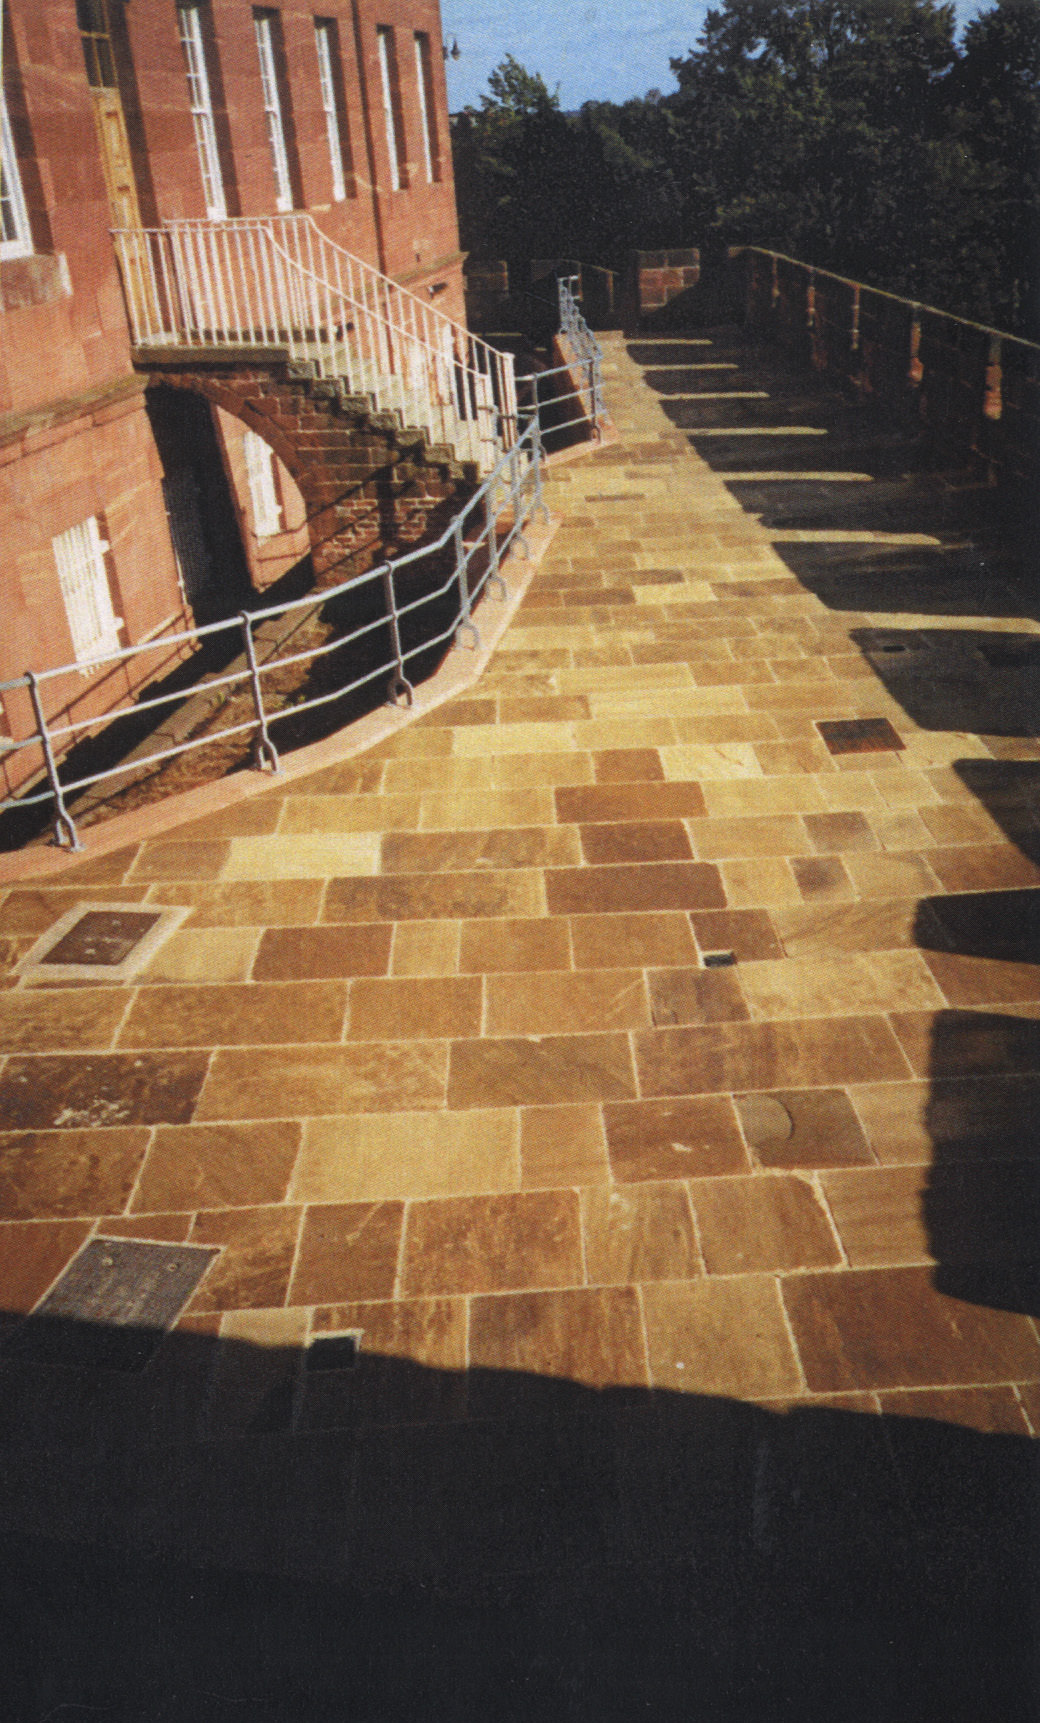 679-03 Chester Castle9